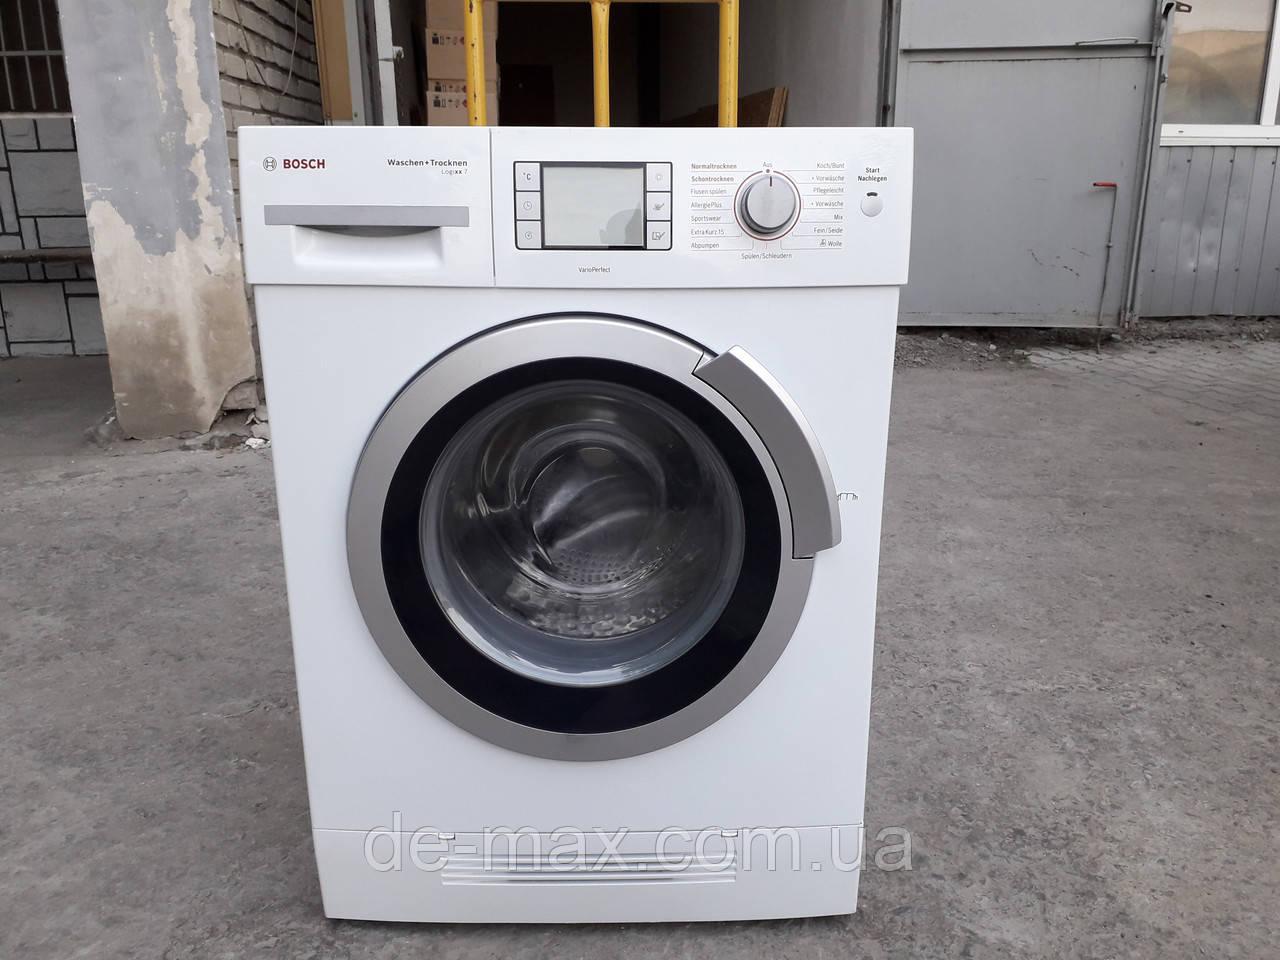 Стирально-сушильная машина Bosch 2в1 А++ 8 5кг  7 500 грн ... abe364aeaf21c